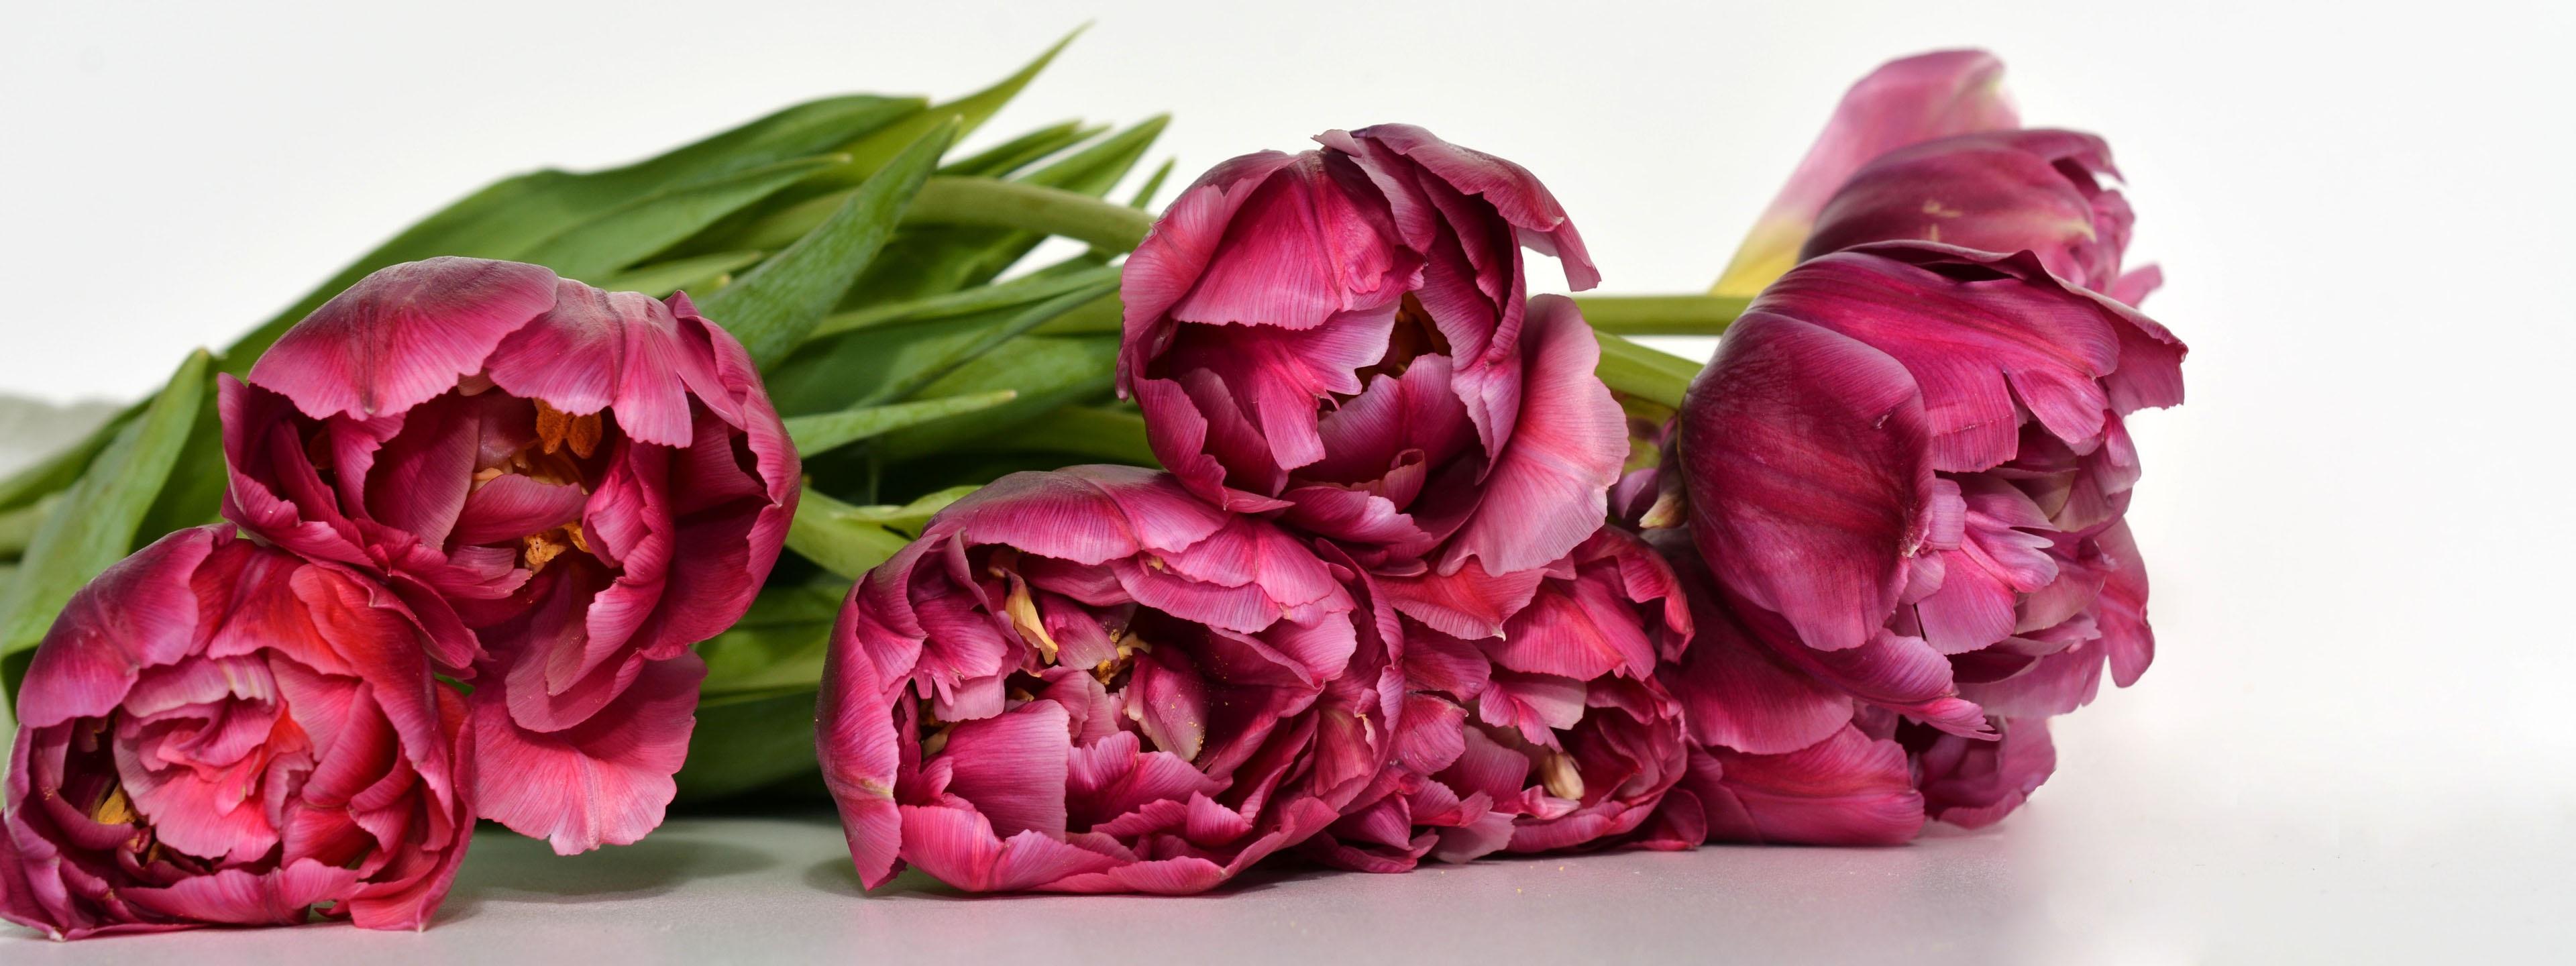 Free images nature flower petal bloom tulip banner pink free images nature flower petal bloom tulip banner pink thank you beautiful elegant tulips magenta bouquet of flowers floristry izmirmasajfo